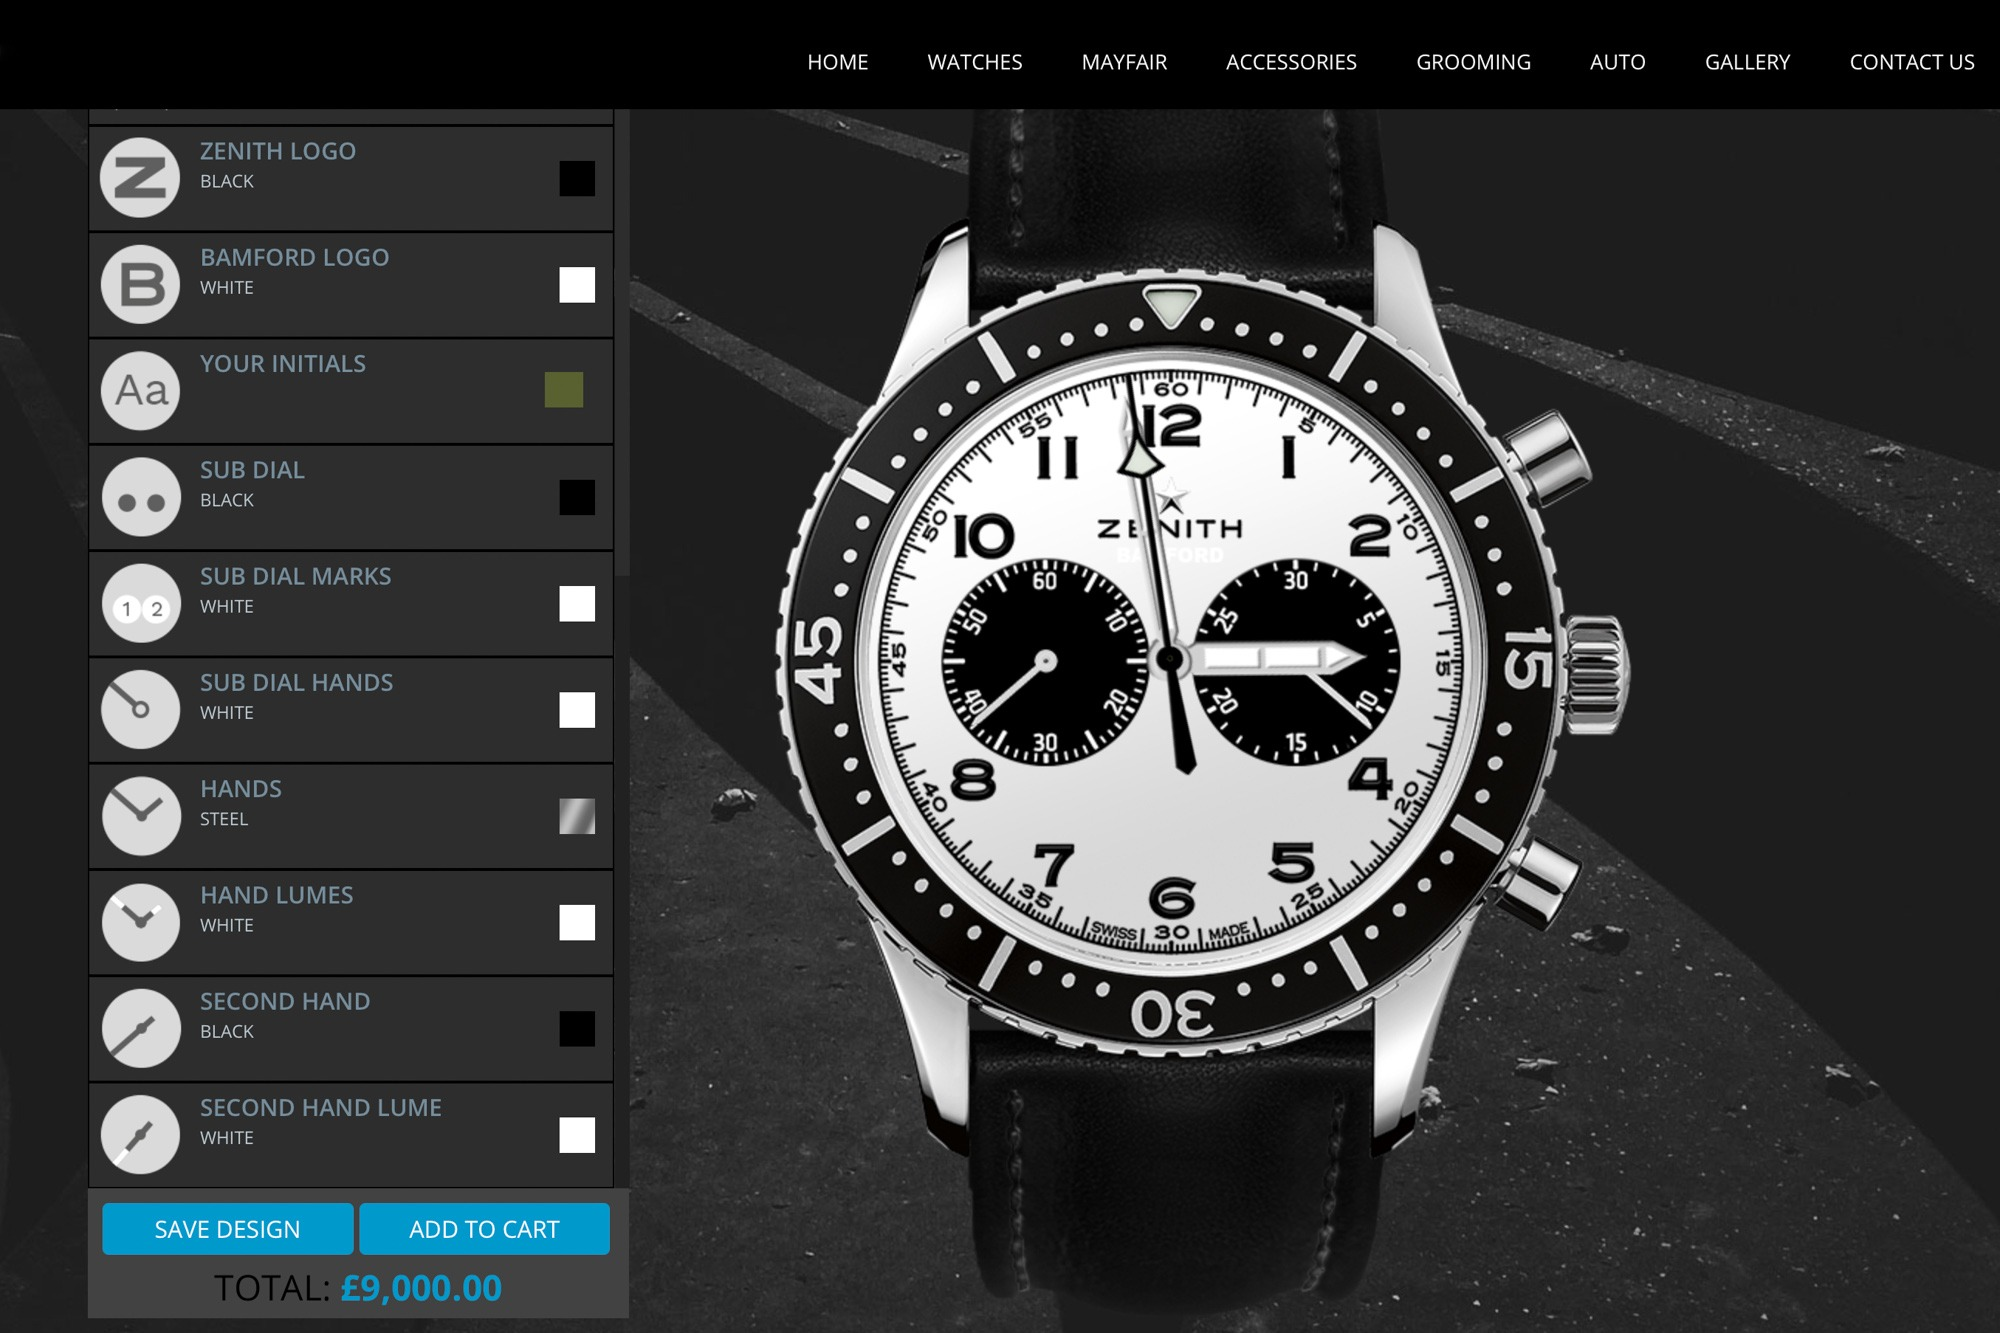 Zenith Chronograph - Bamford - Personnalisation de montres BWD